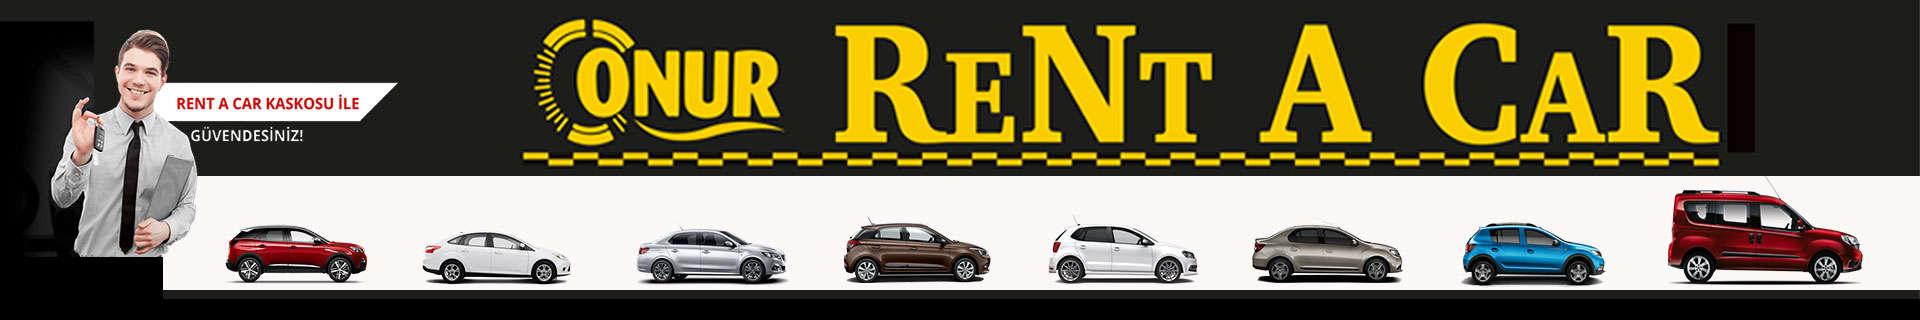 onur_rent_a_car_banner2